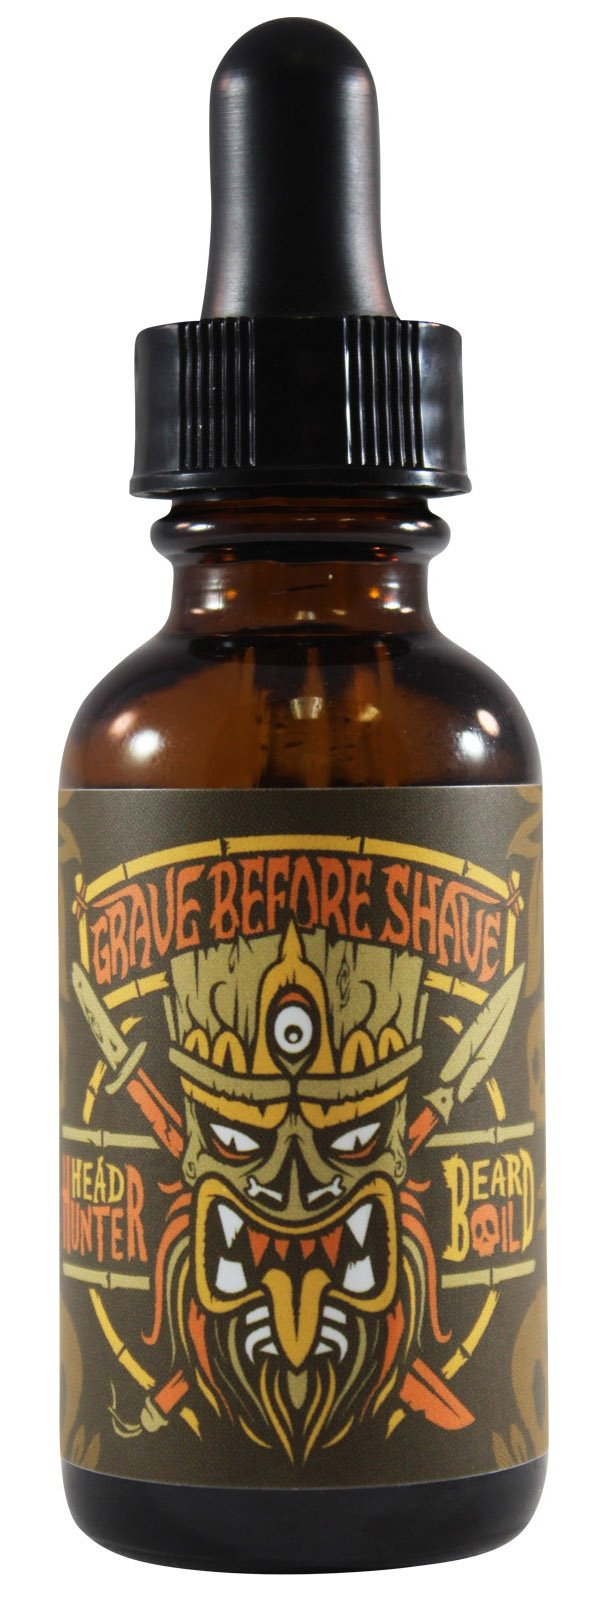 GRAVE BEFORE SHAVE HEAD HUNTER BEARD OIL